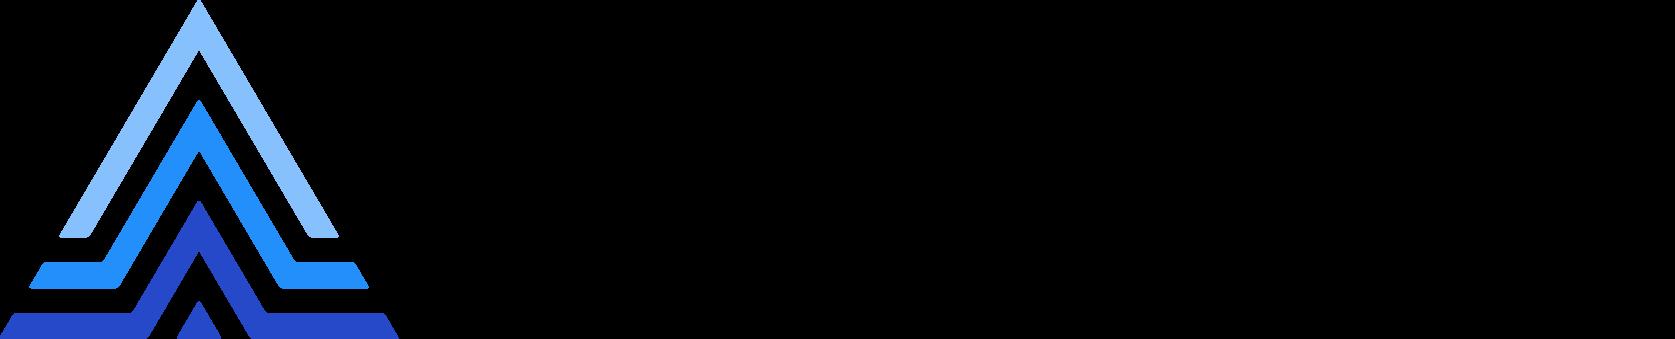 Actian DataConnect Integration Platform logo